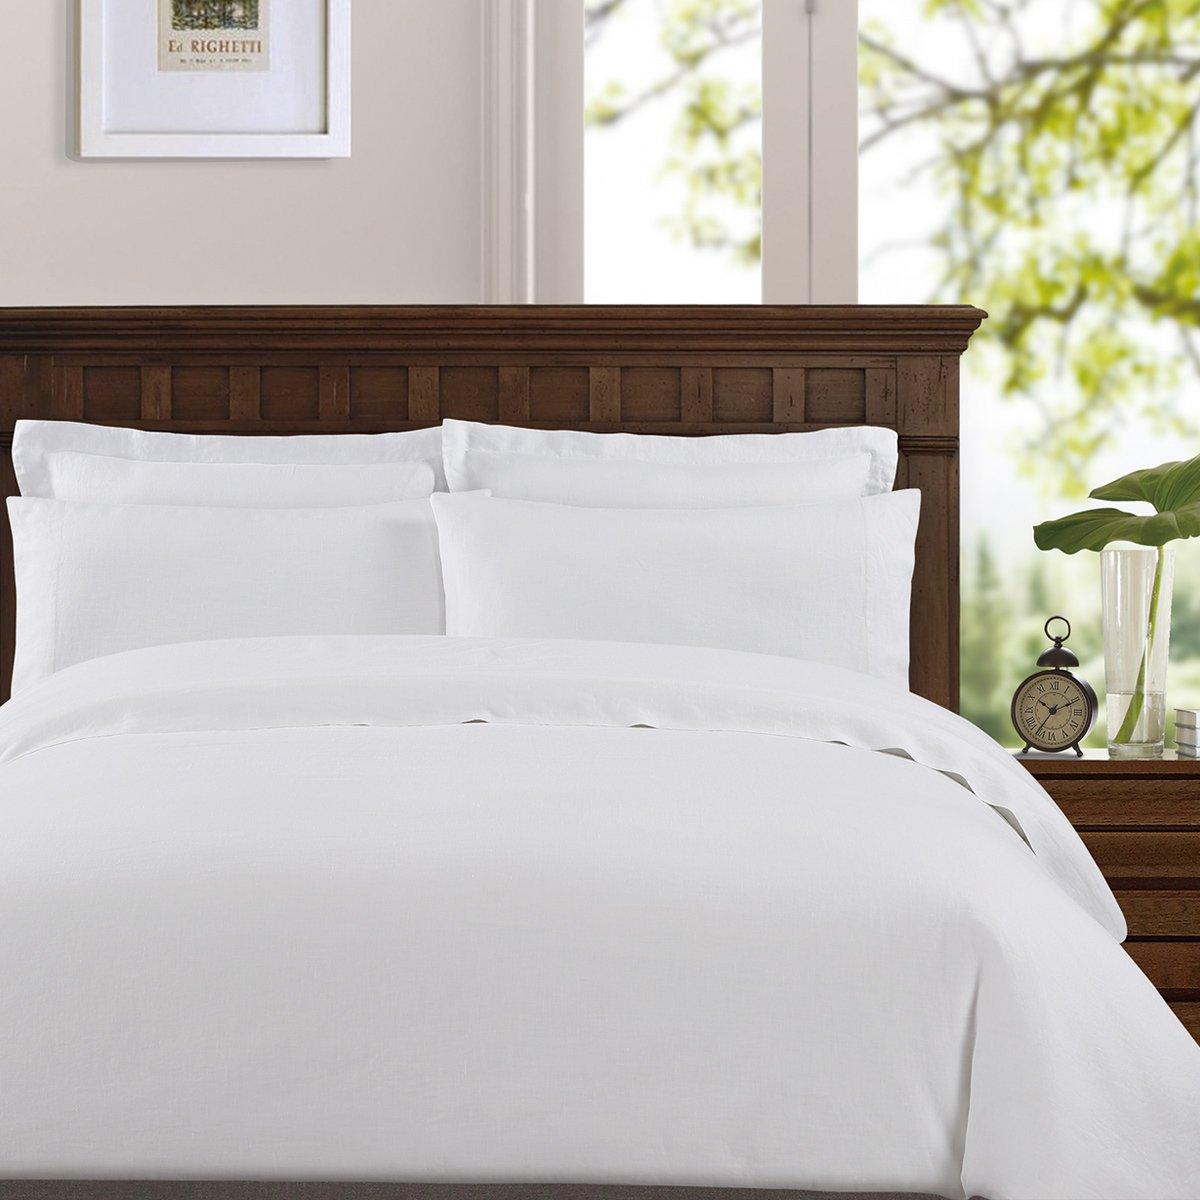 Echelon Home Washed Belgian Linen Sheet Set, California King, Eggshell White